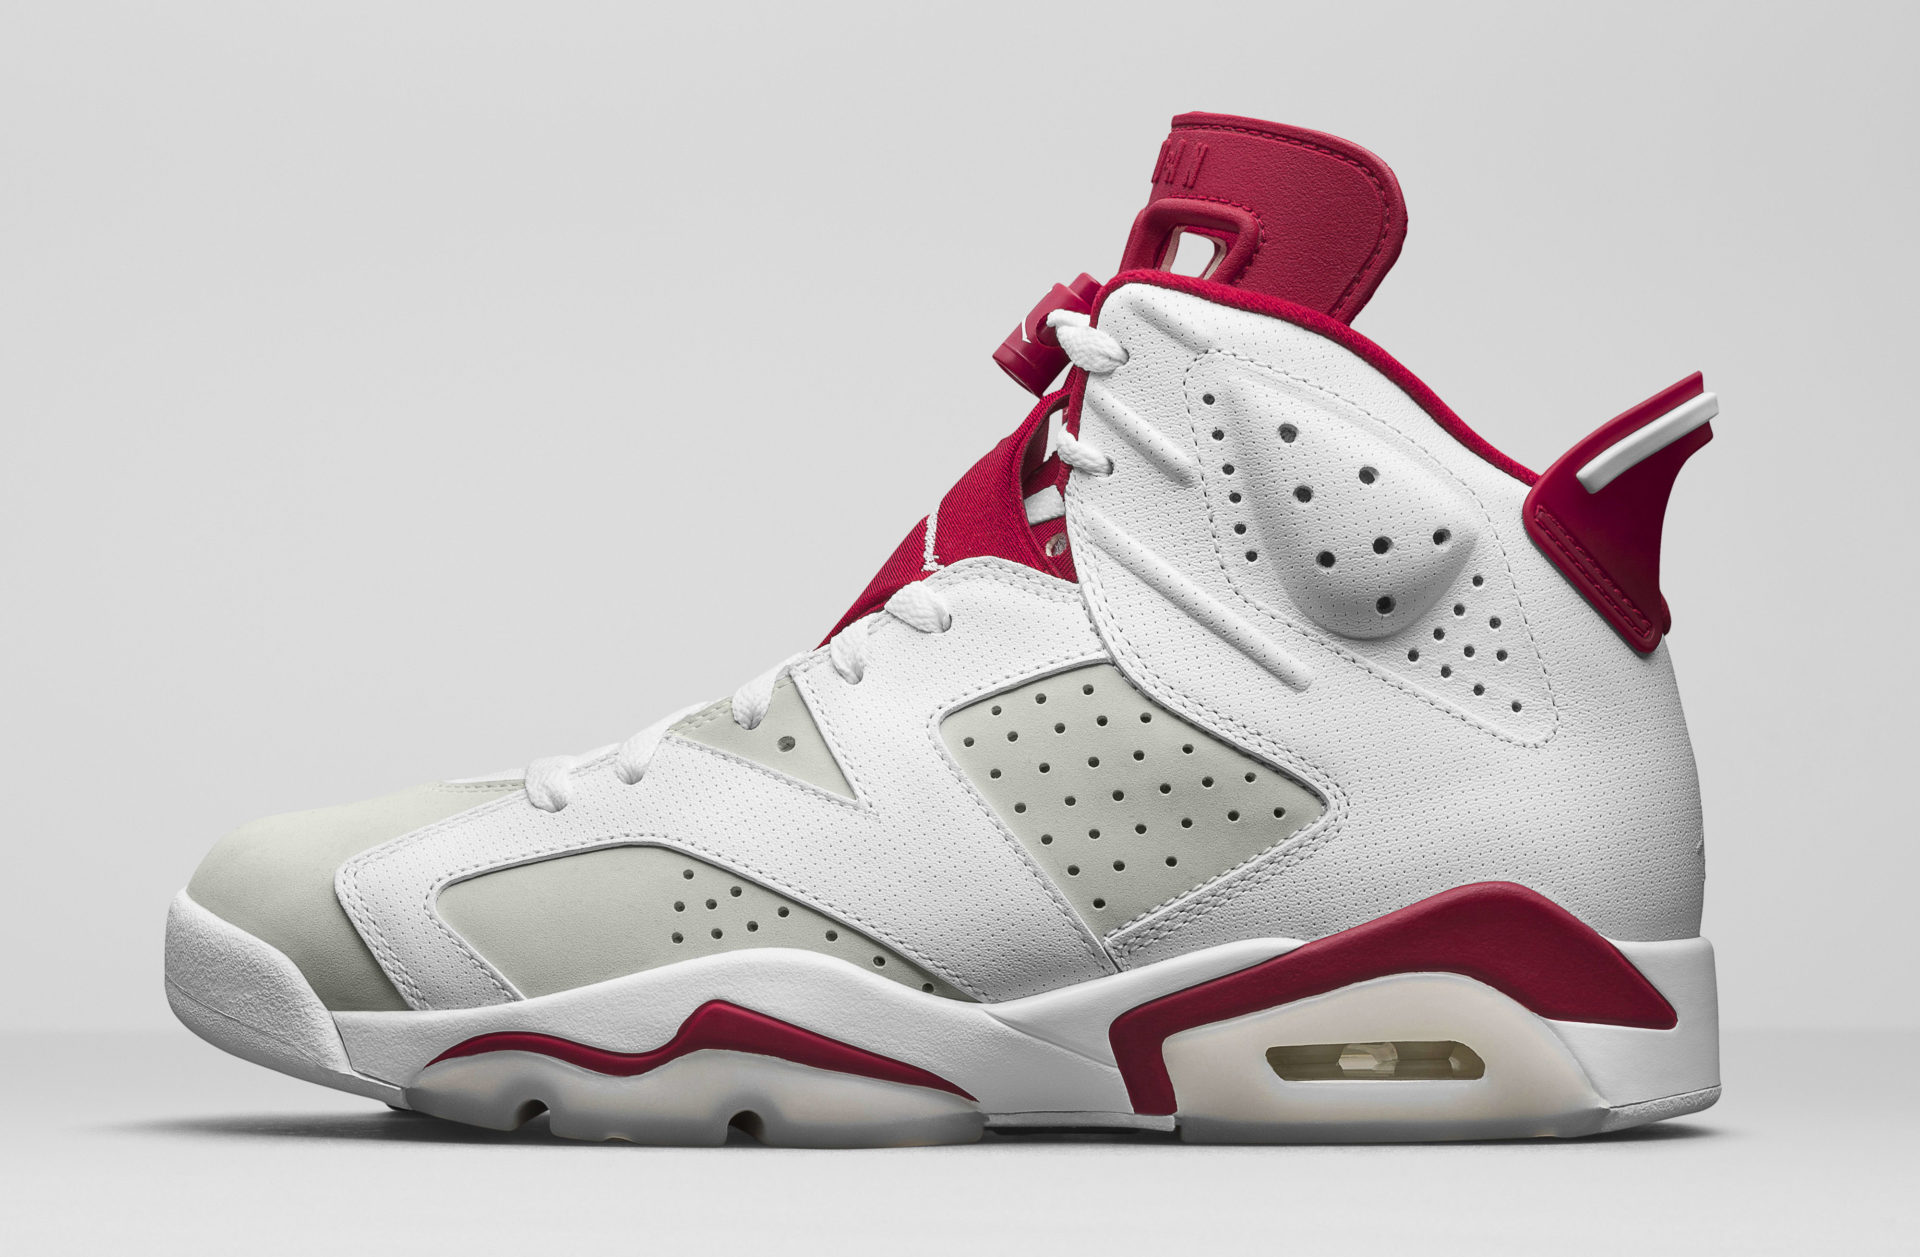 L'Air Jordan 6 sera présente en 2017.